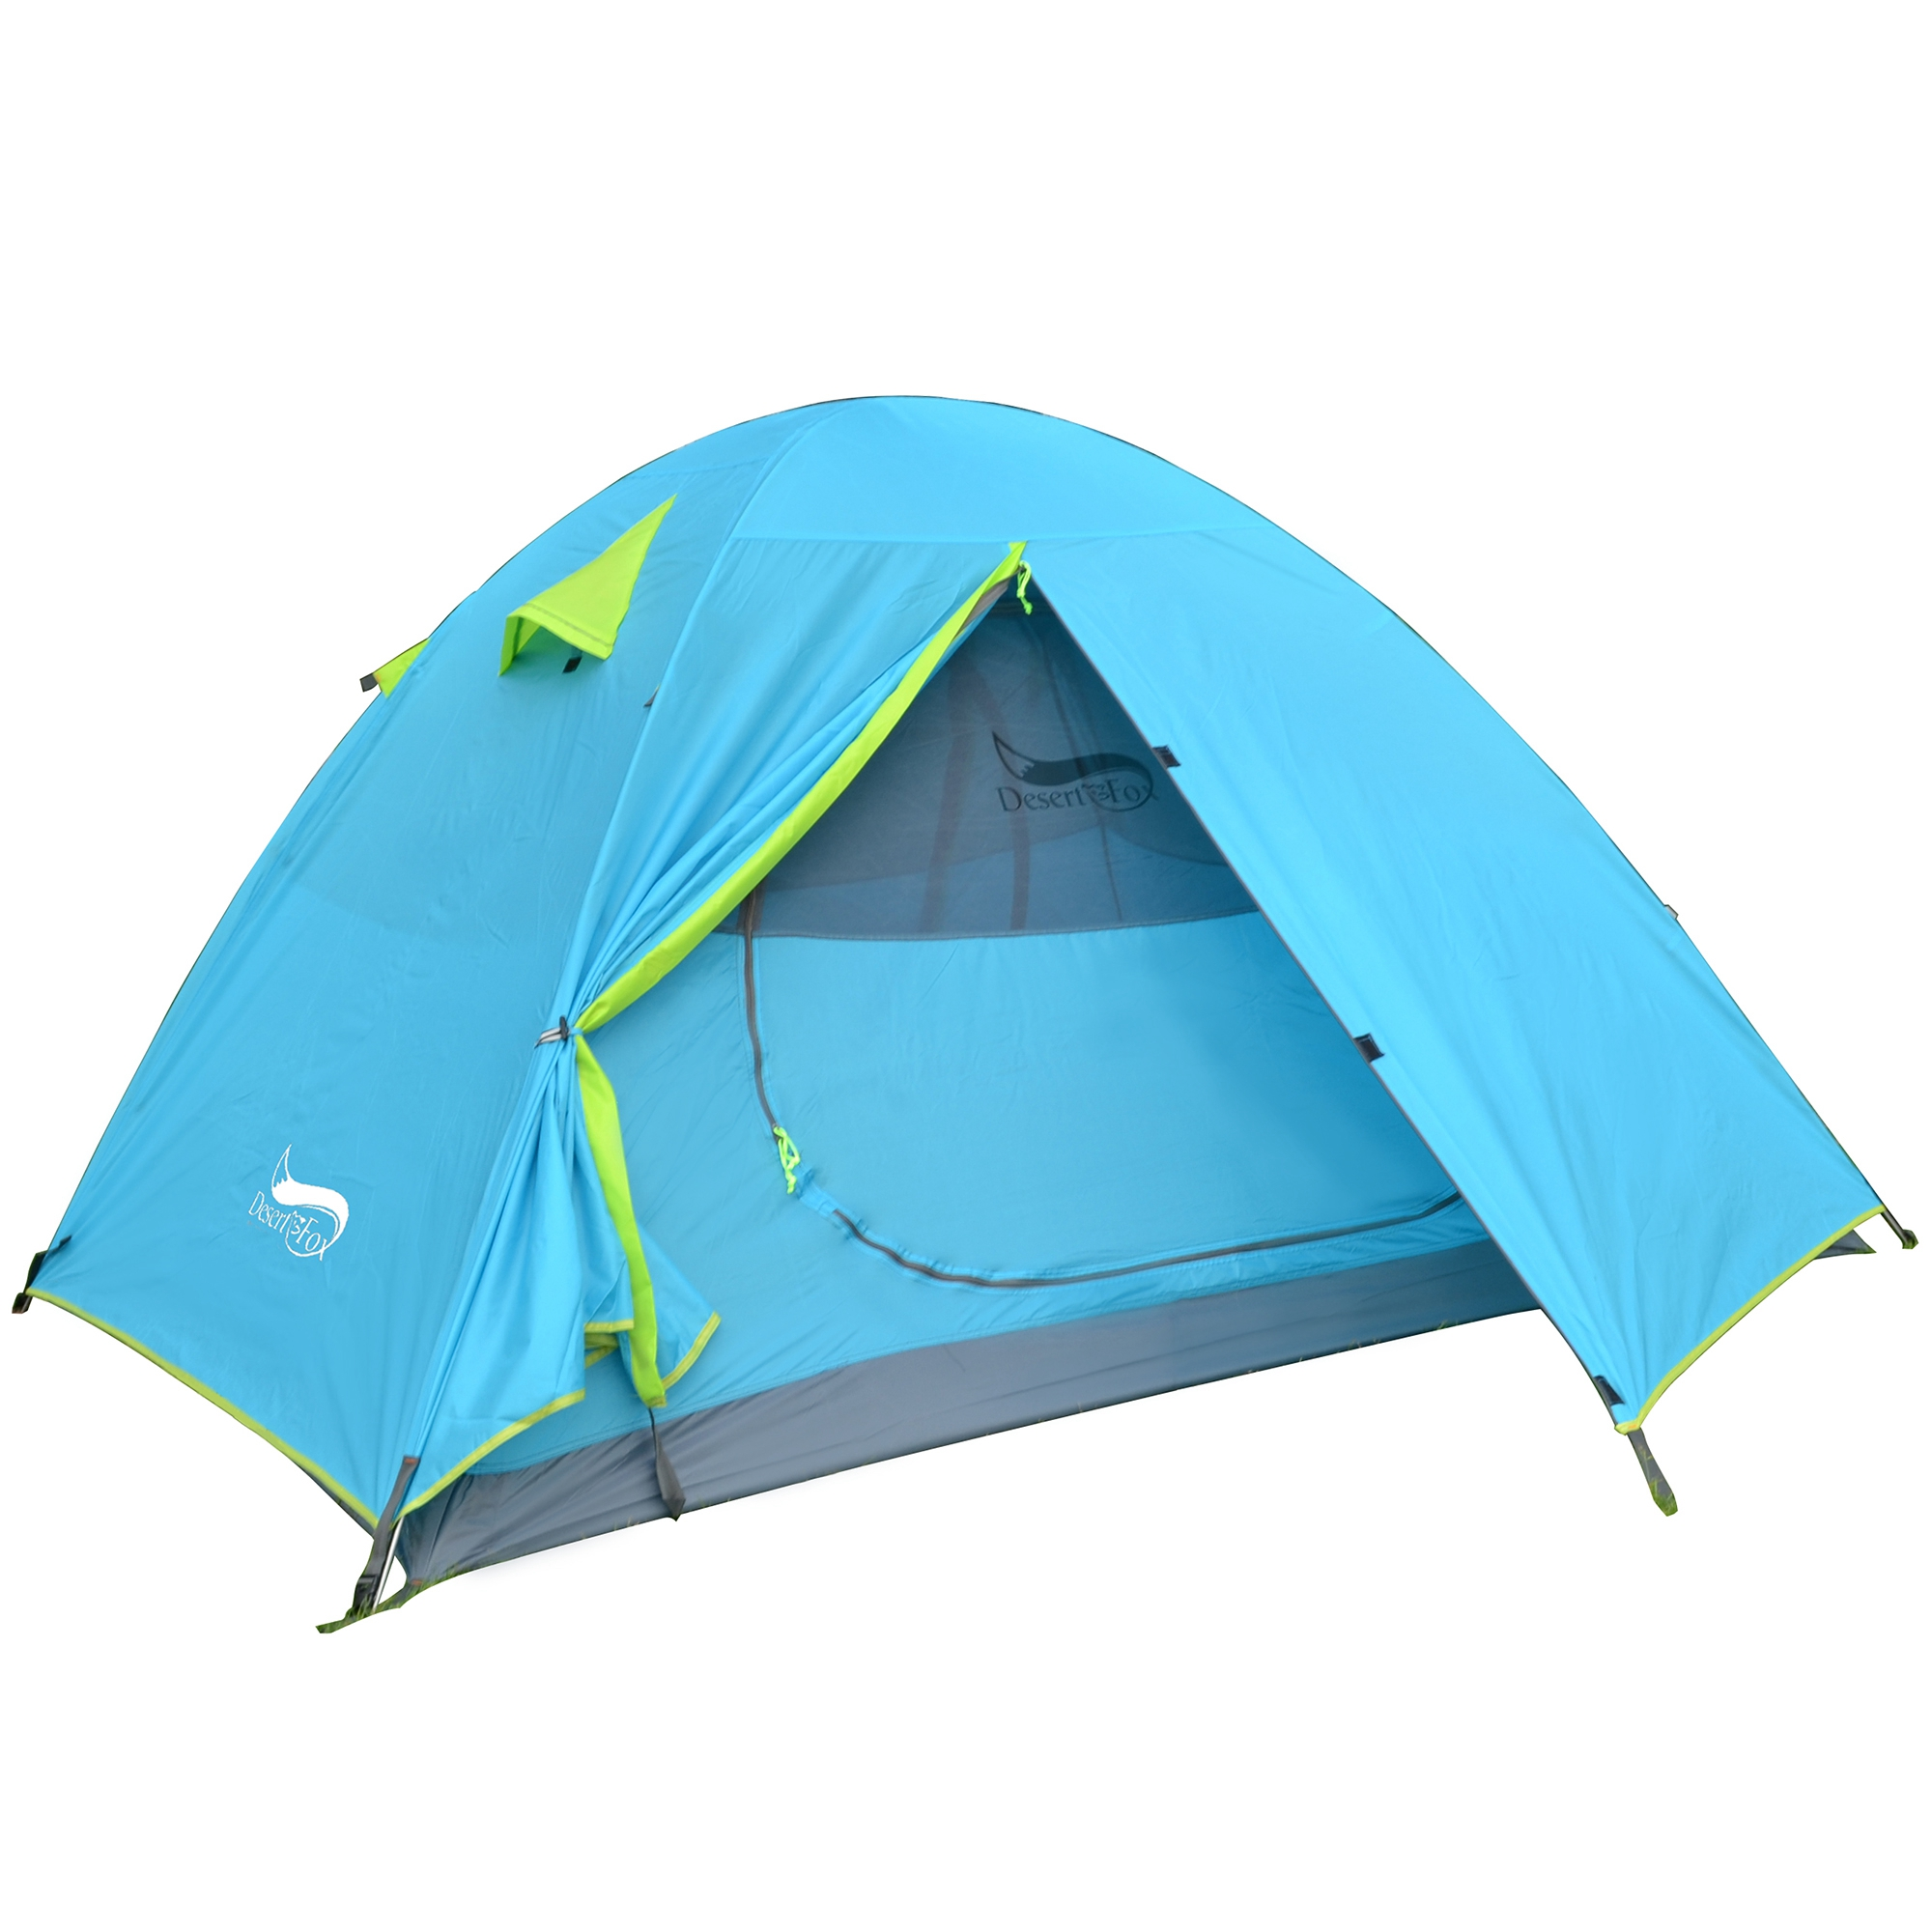 2 person tent blue